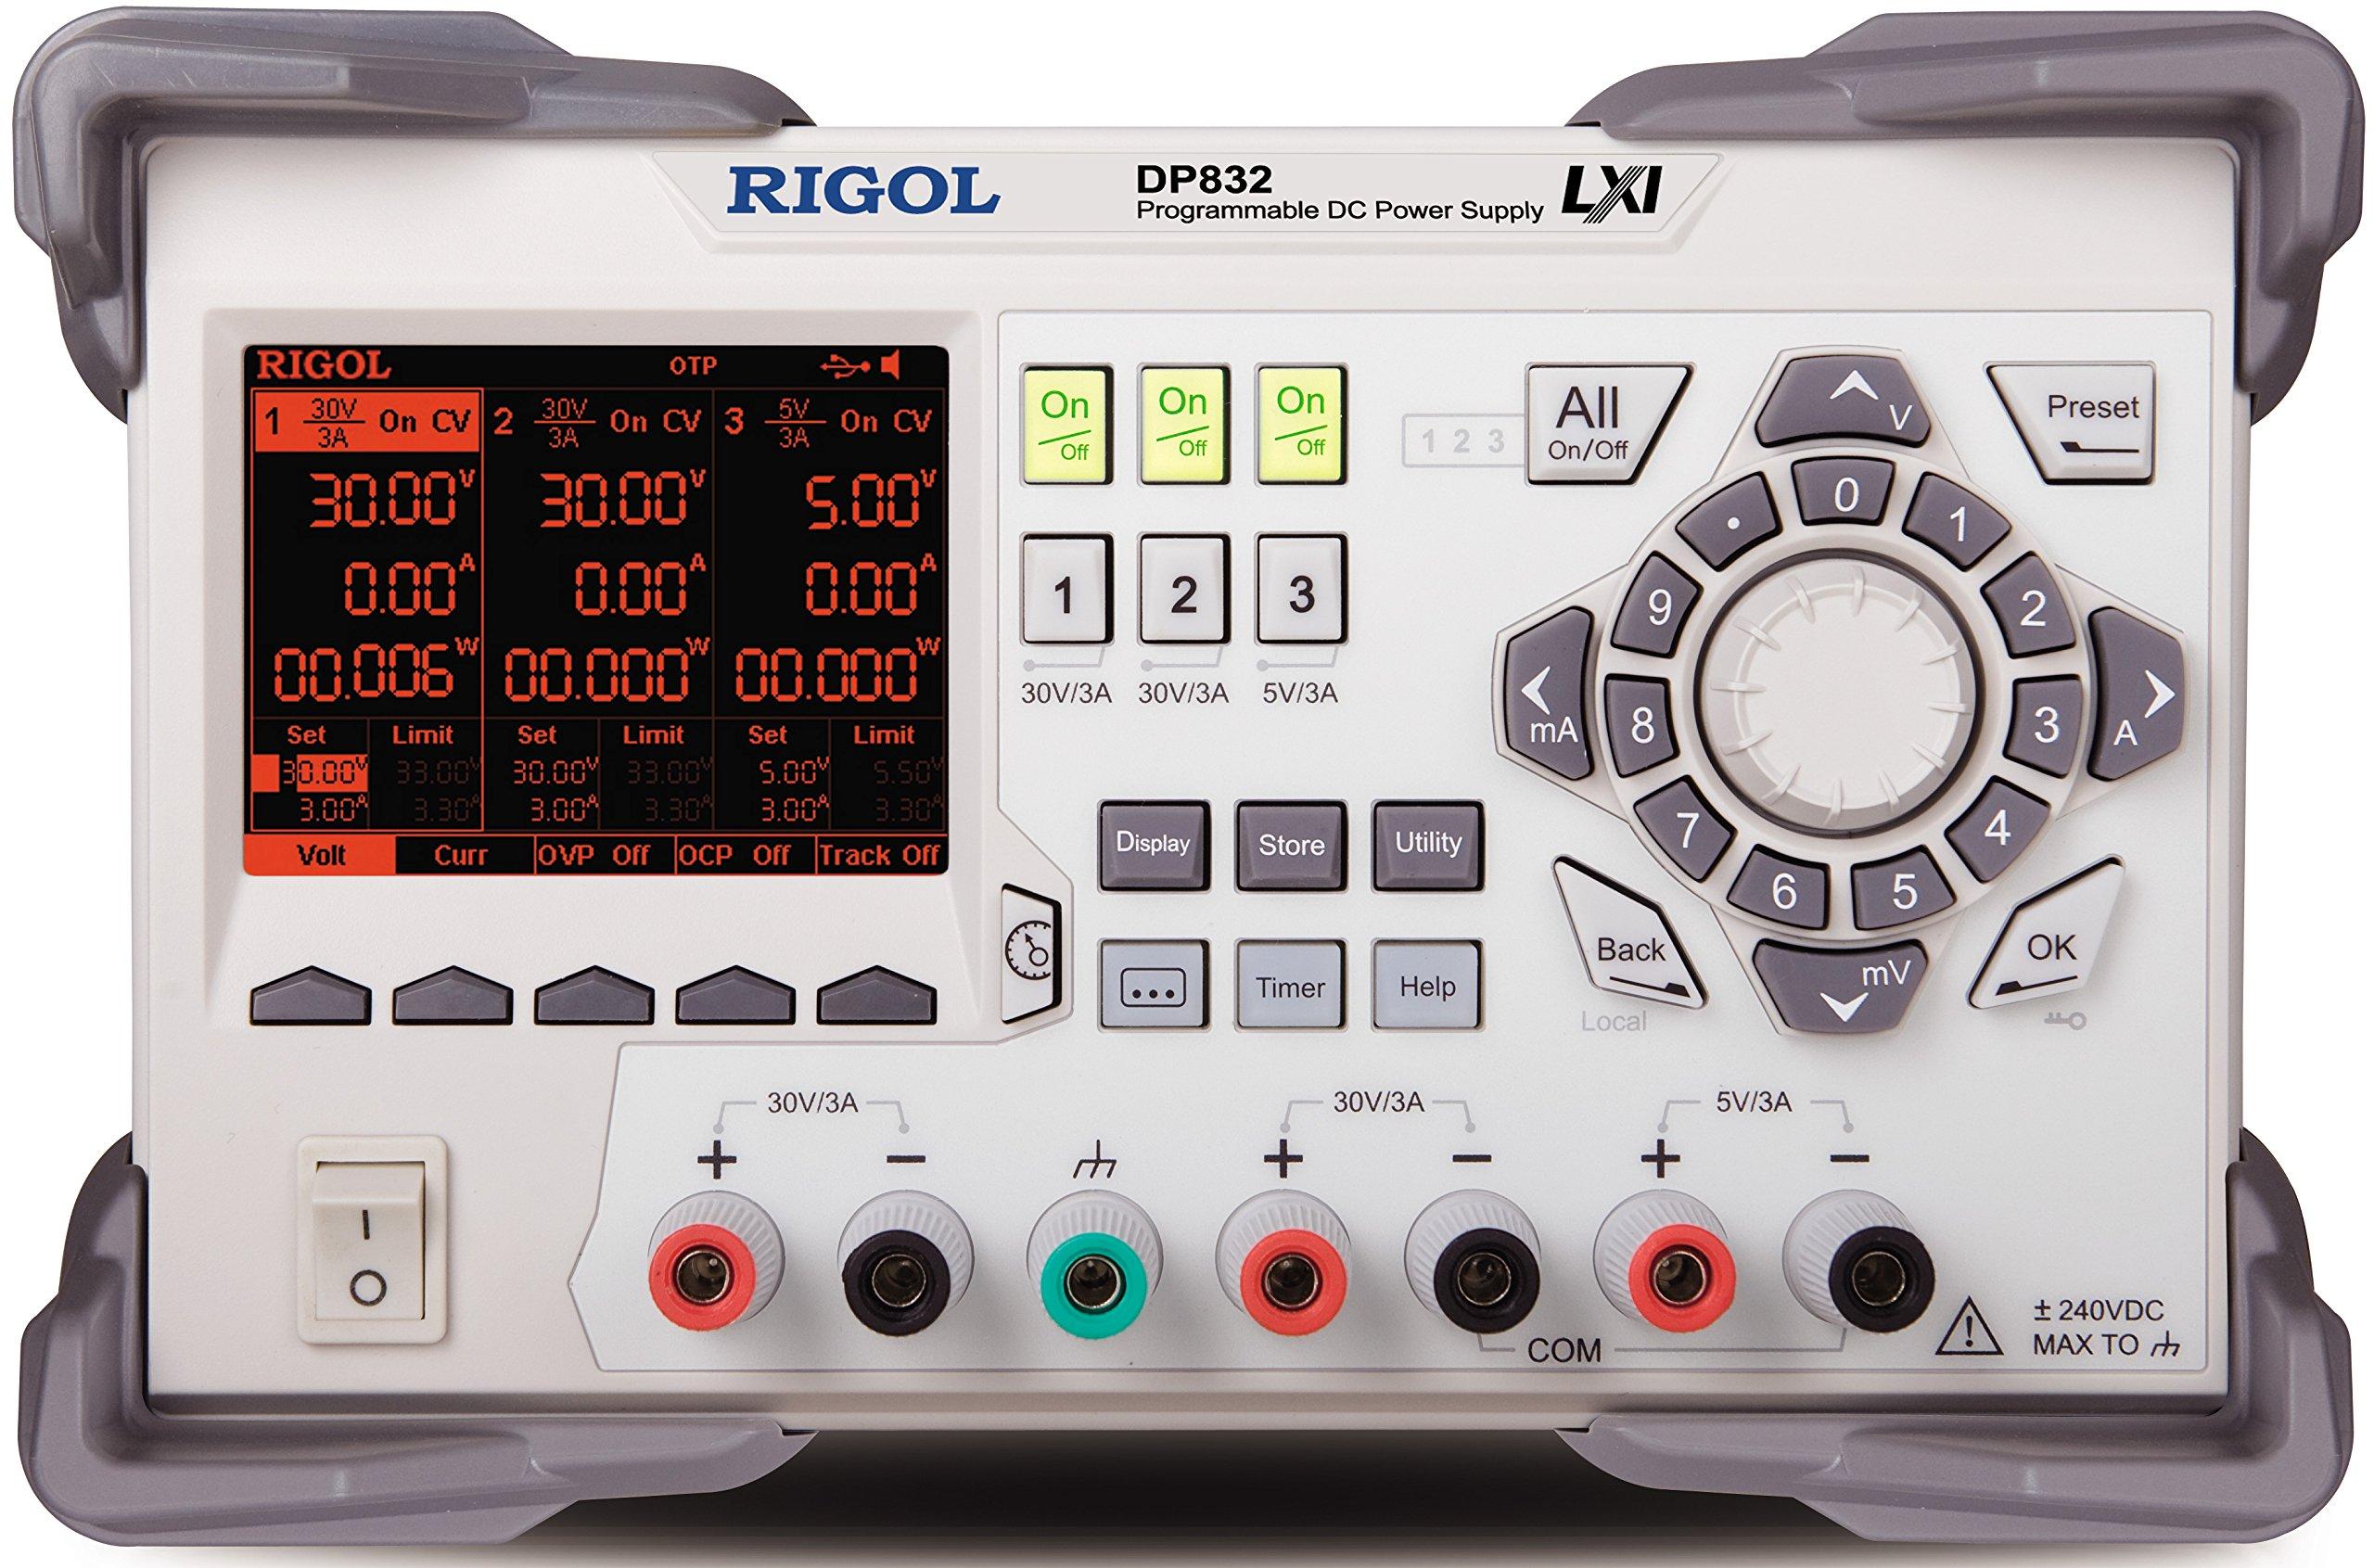 Rigol DP832 Triple Output 195 Watt Power Supply